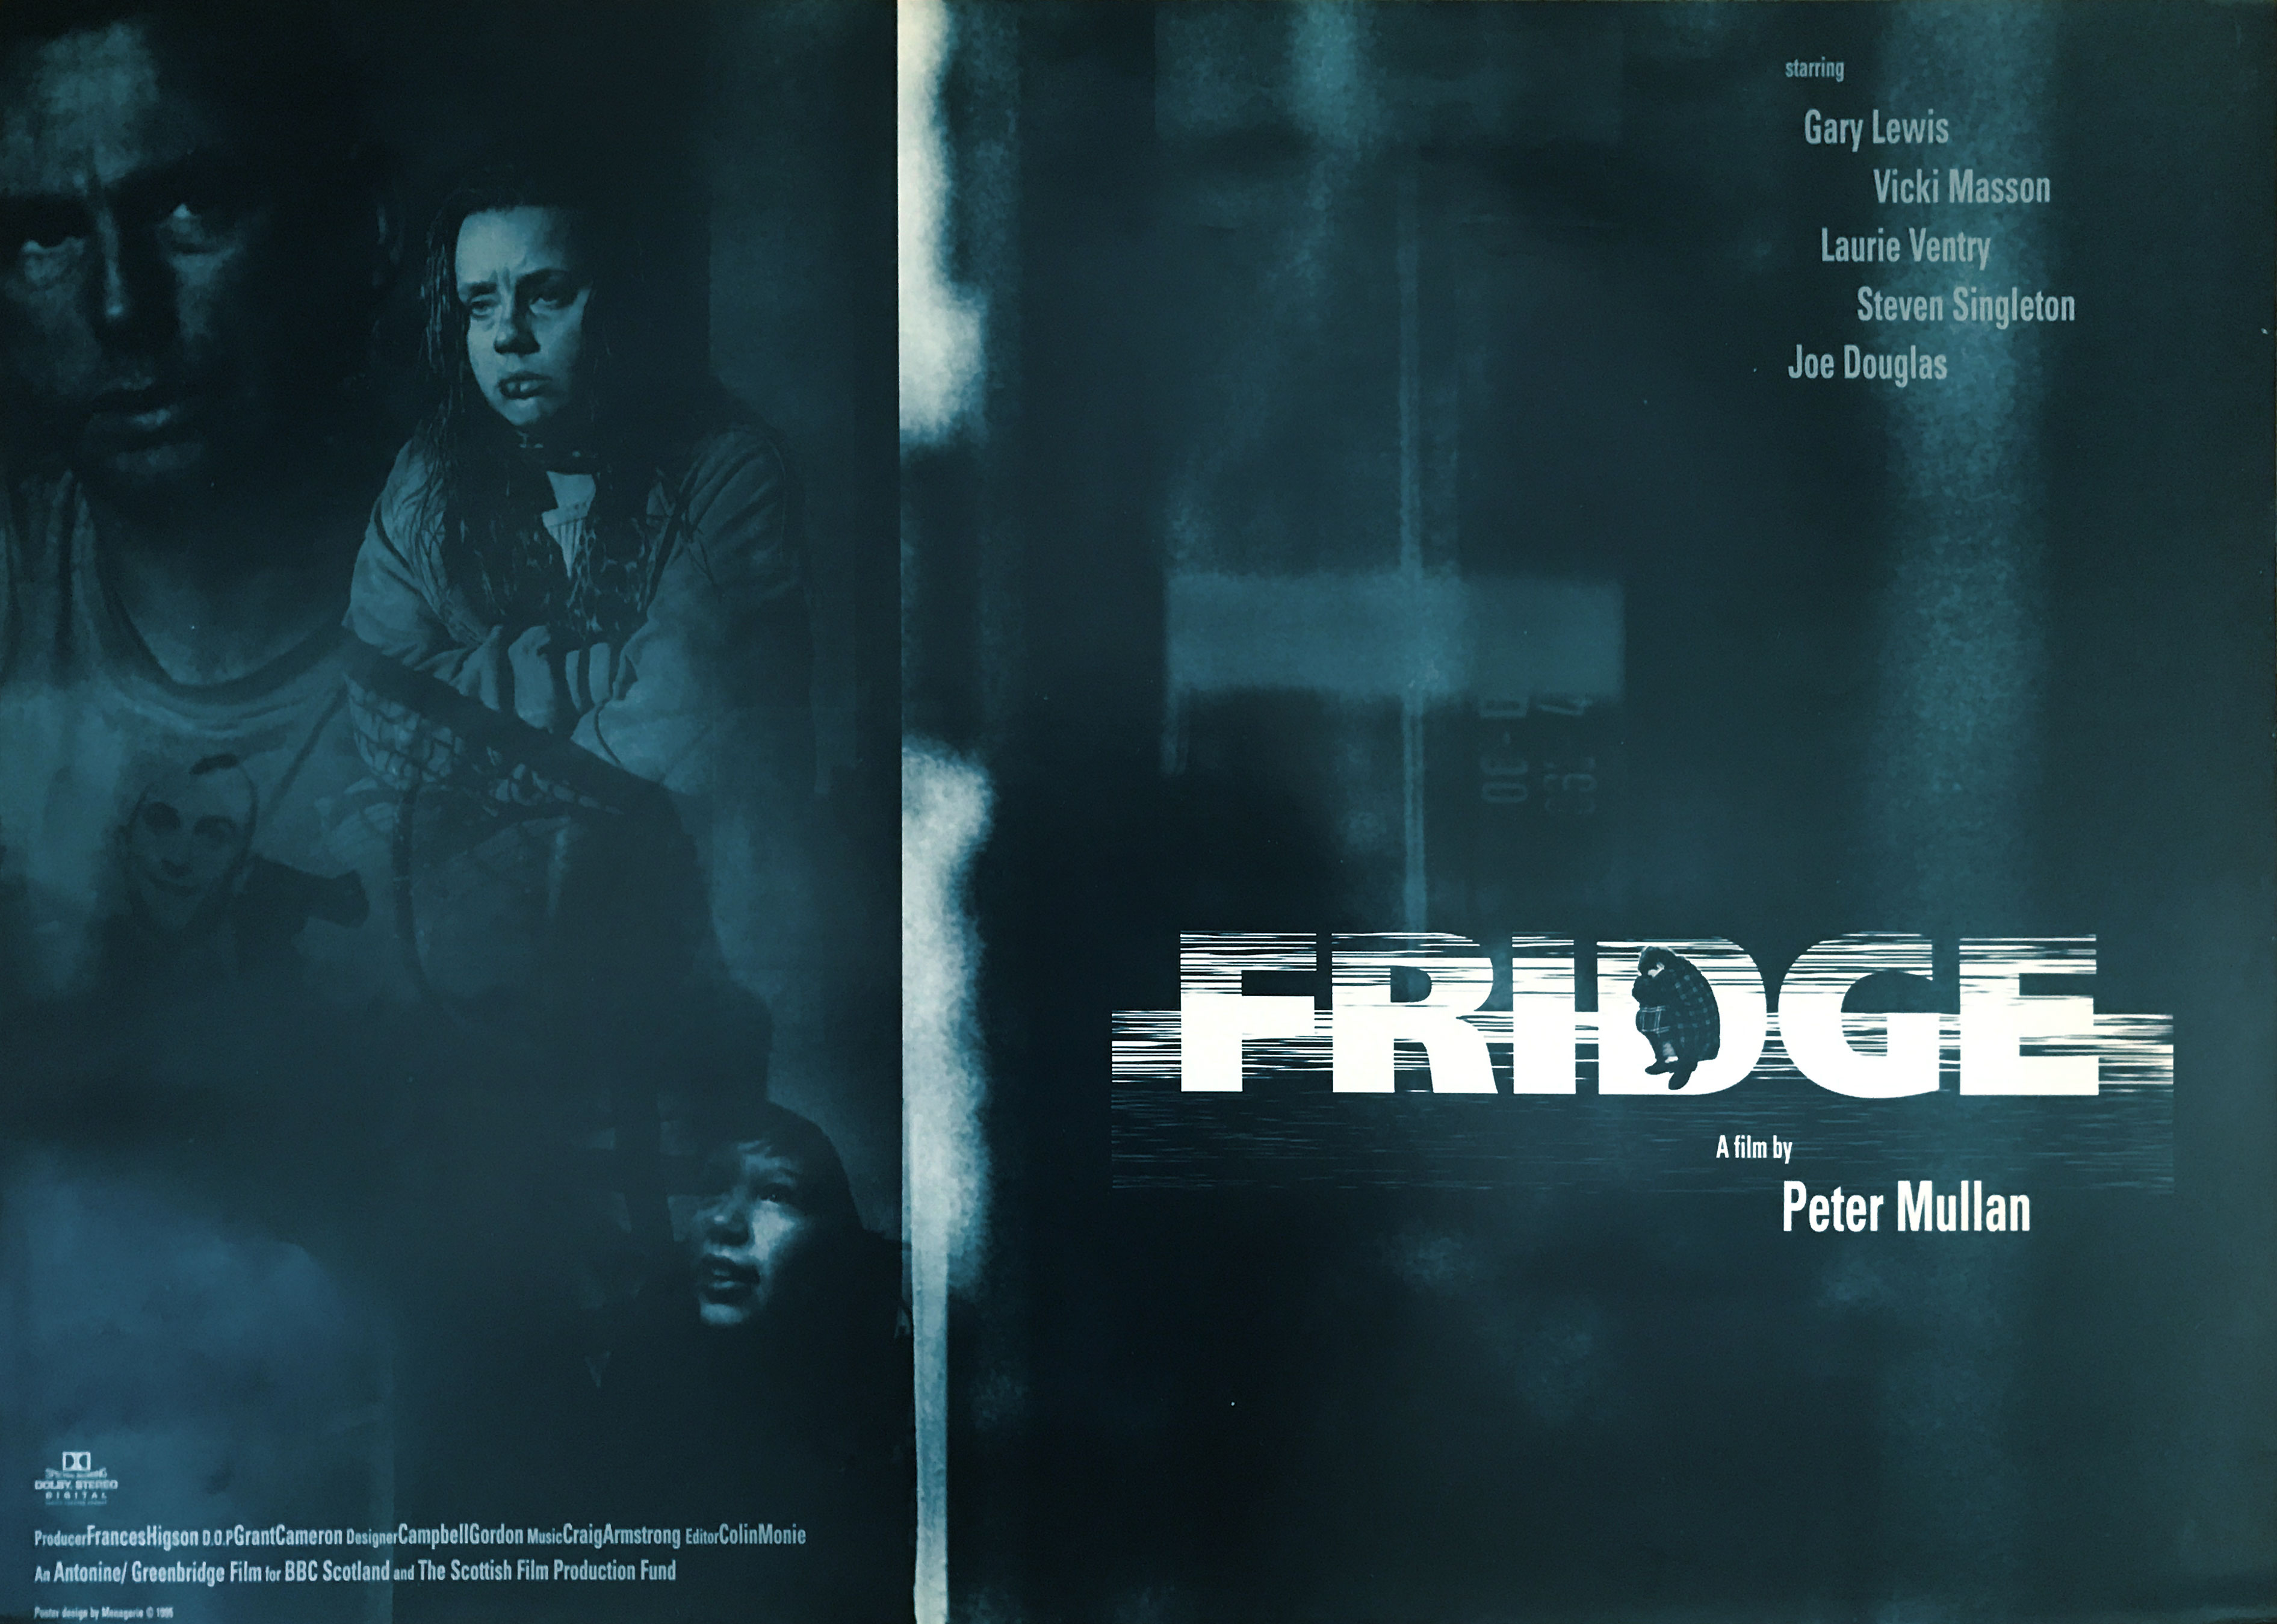 Fridge, a film by Peter Mullan, film poster